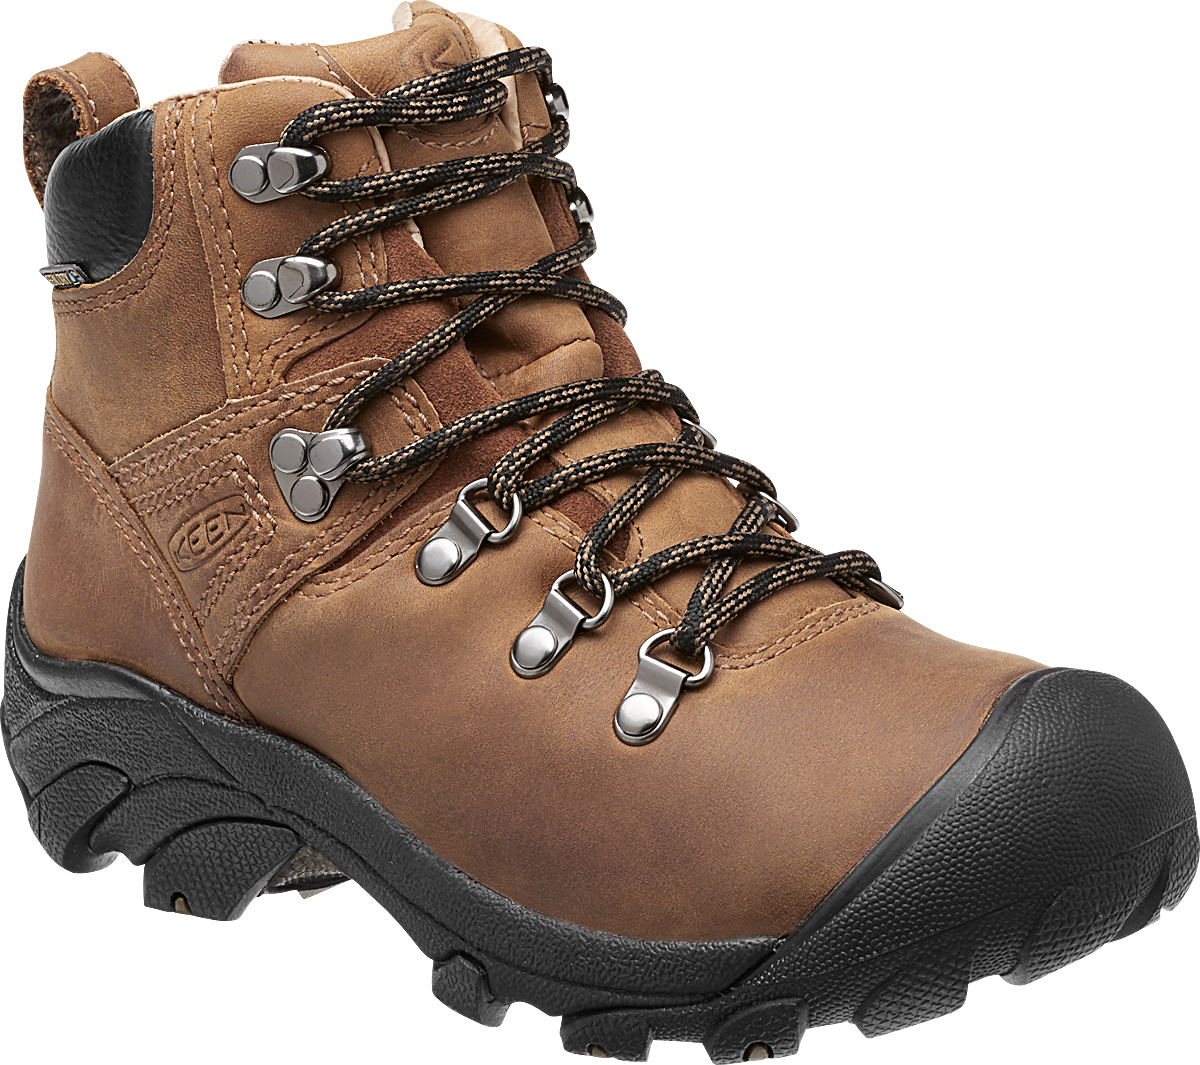 Keen Pyrenees Hiking Boots - Women's | MEC